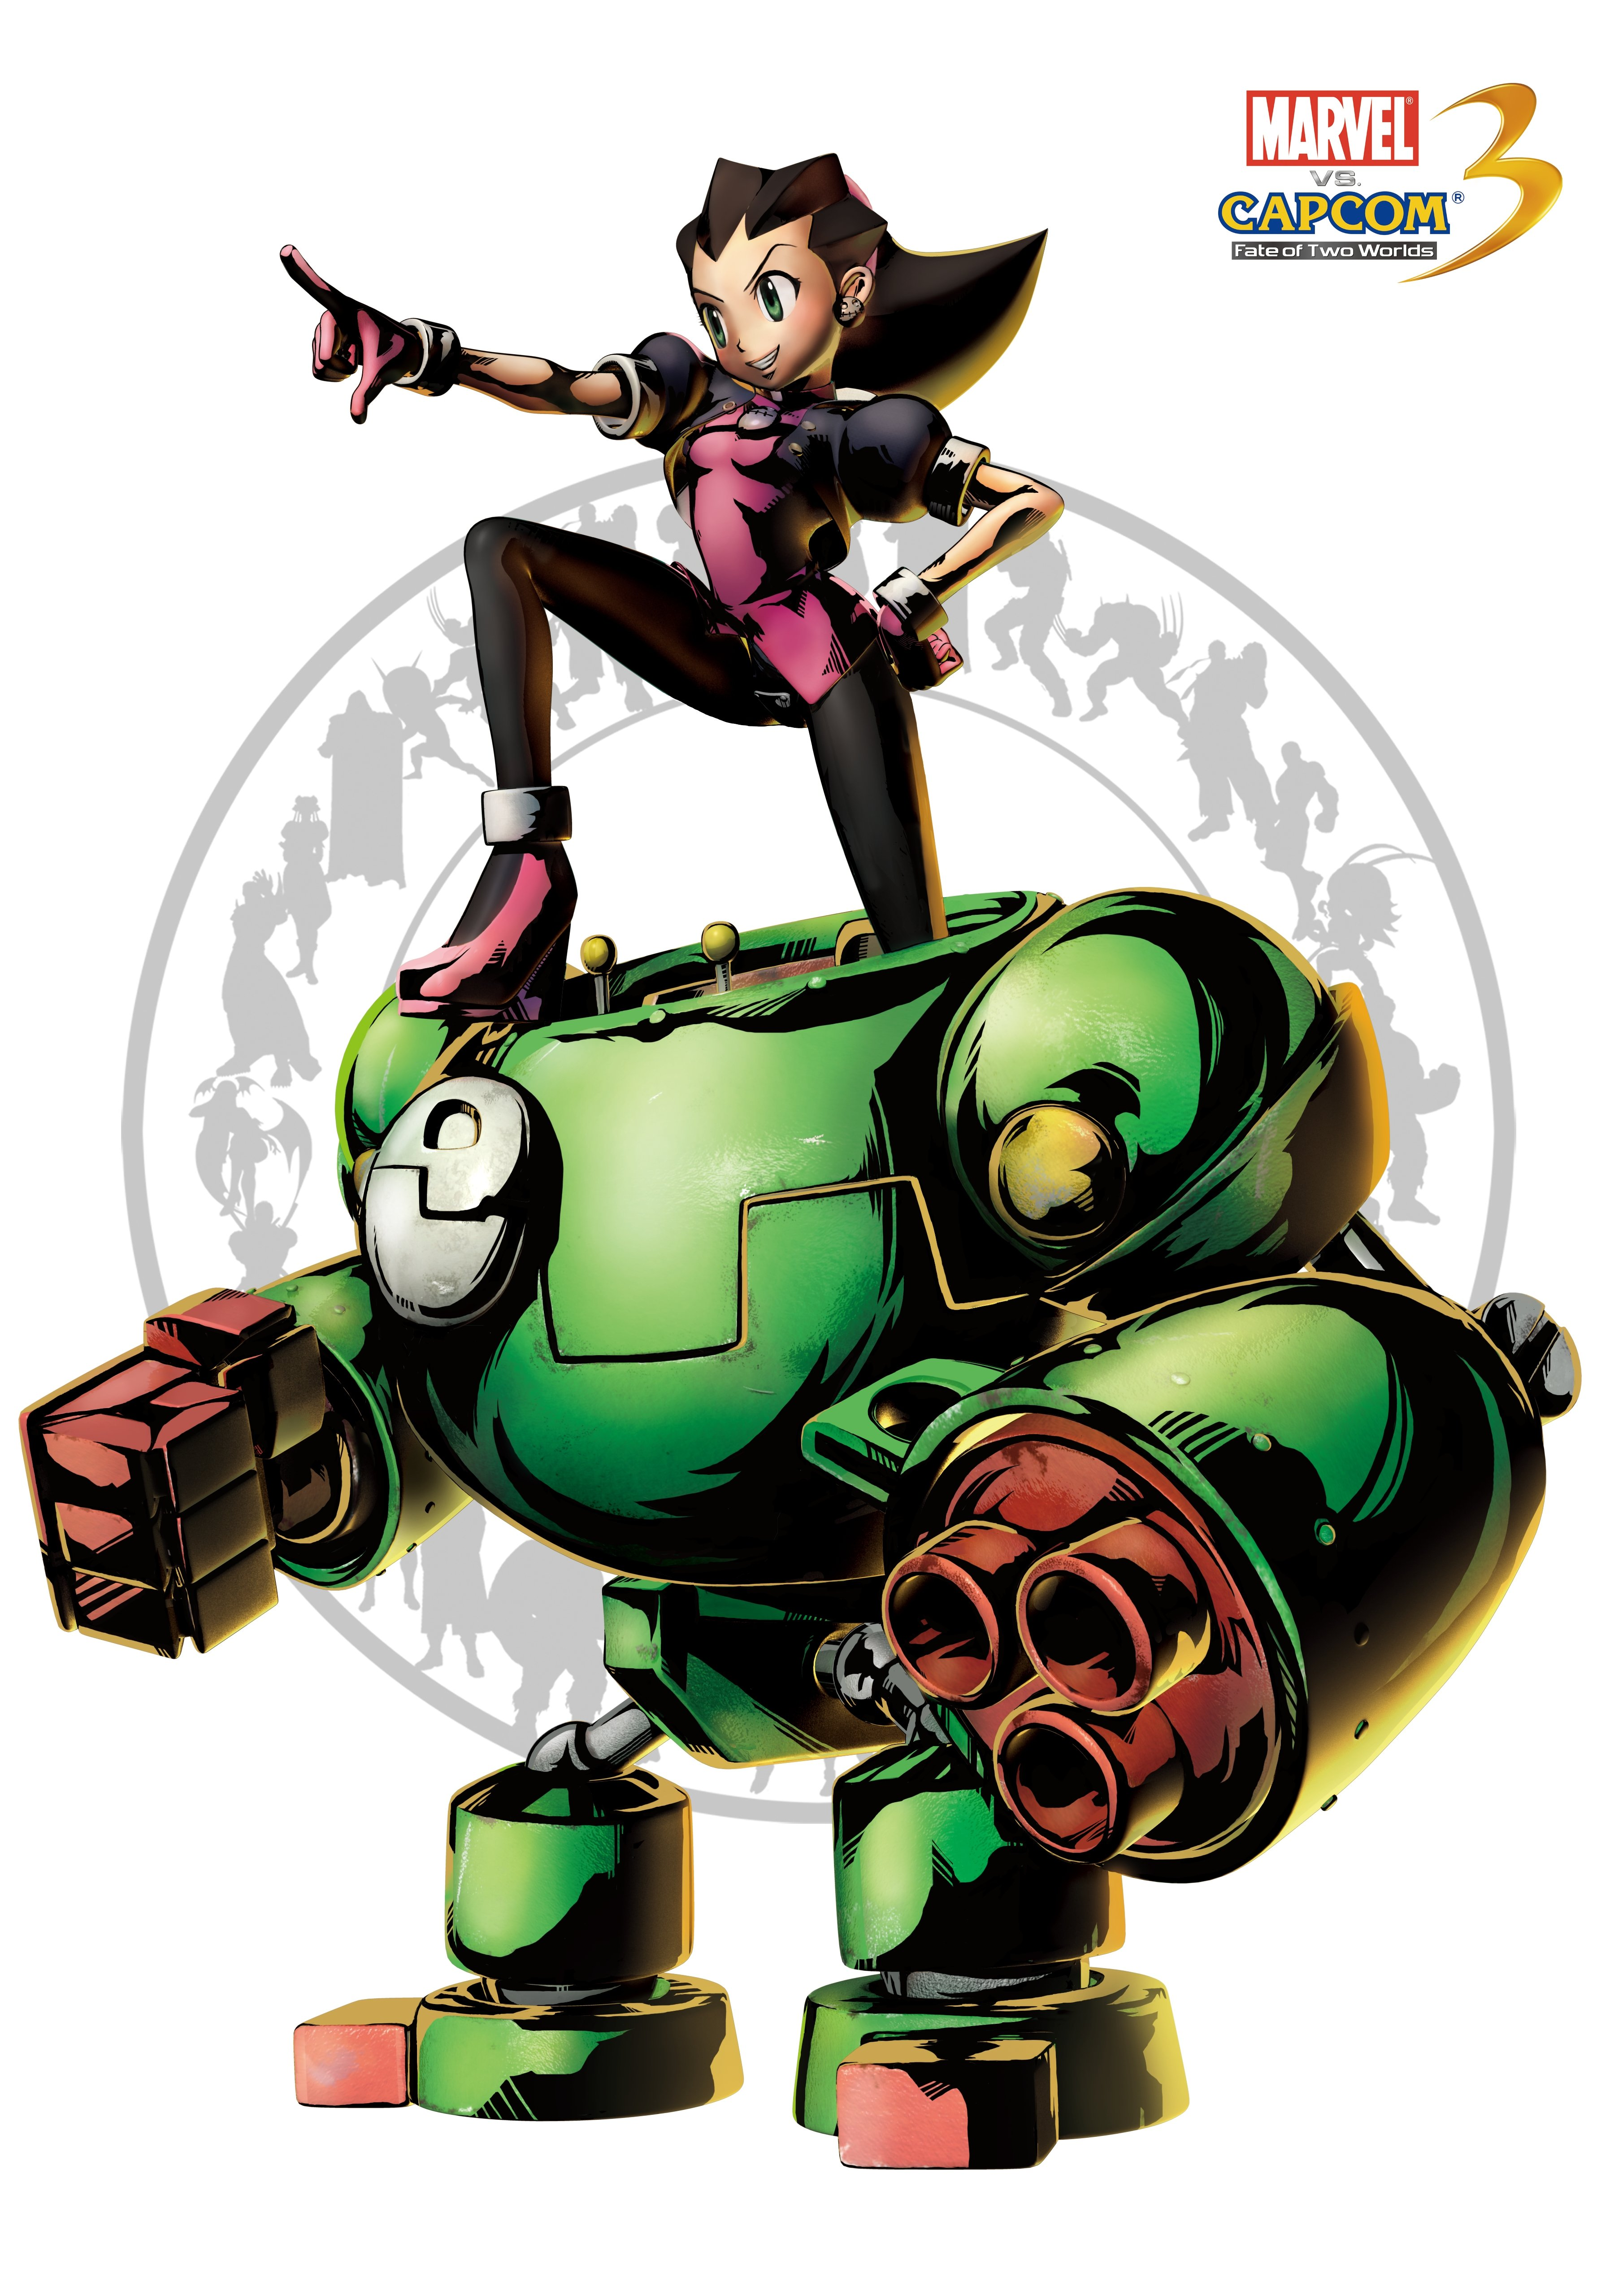 Трон Бонн - Marvel vs. Capcom 3: Fate of Two Worlds Арт, Персонаж